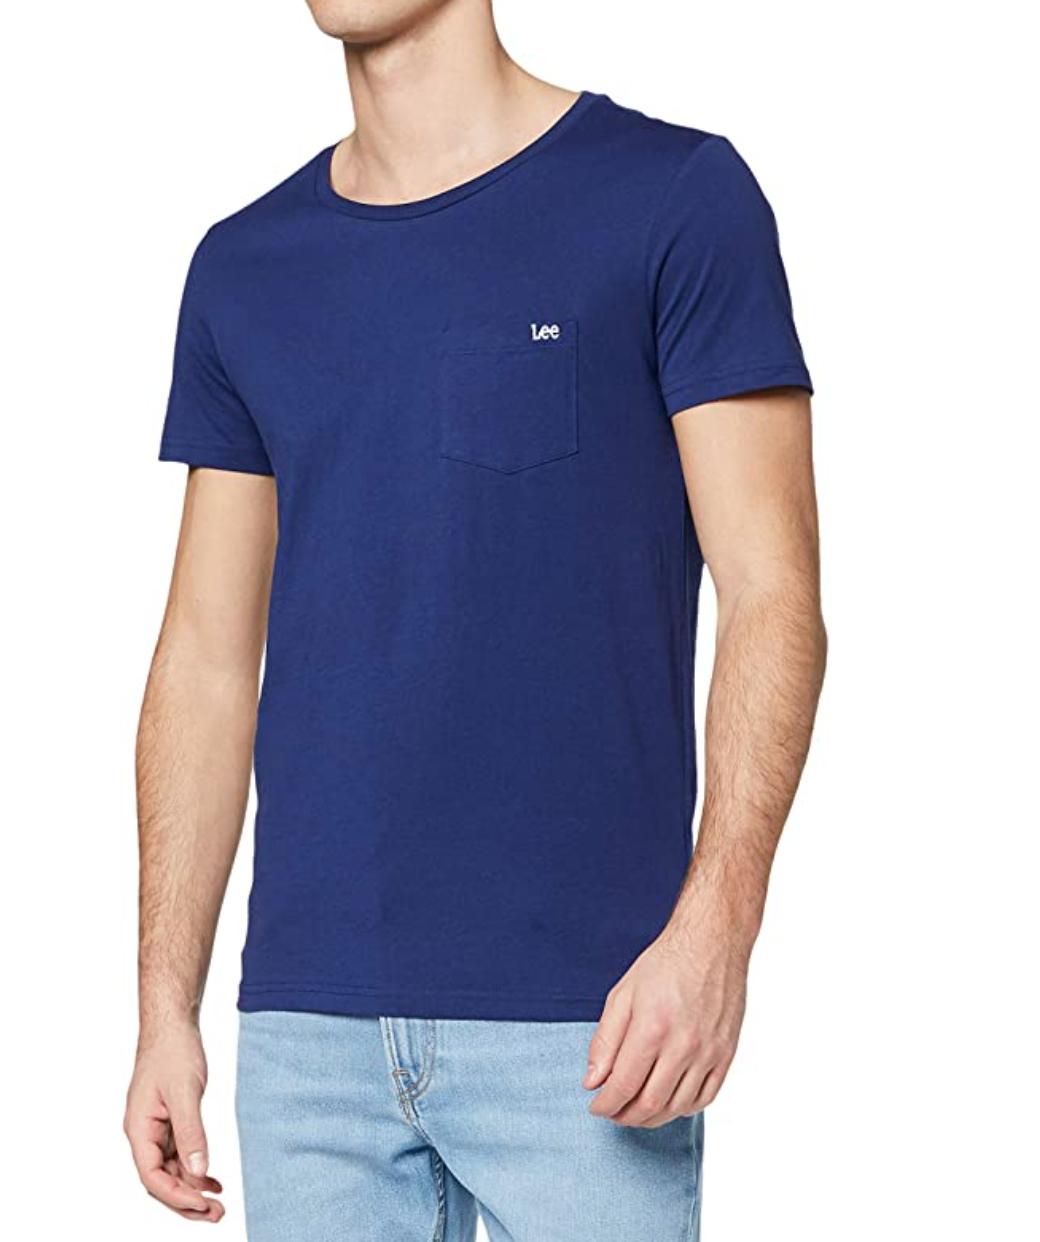 Lee Men's Pocket Tee T-Shirt, Blue £6.40 Prime / +£4.49 non Prime @ Amazon